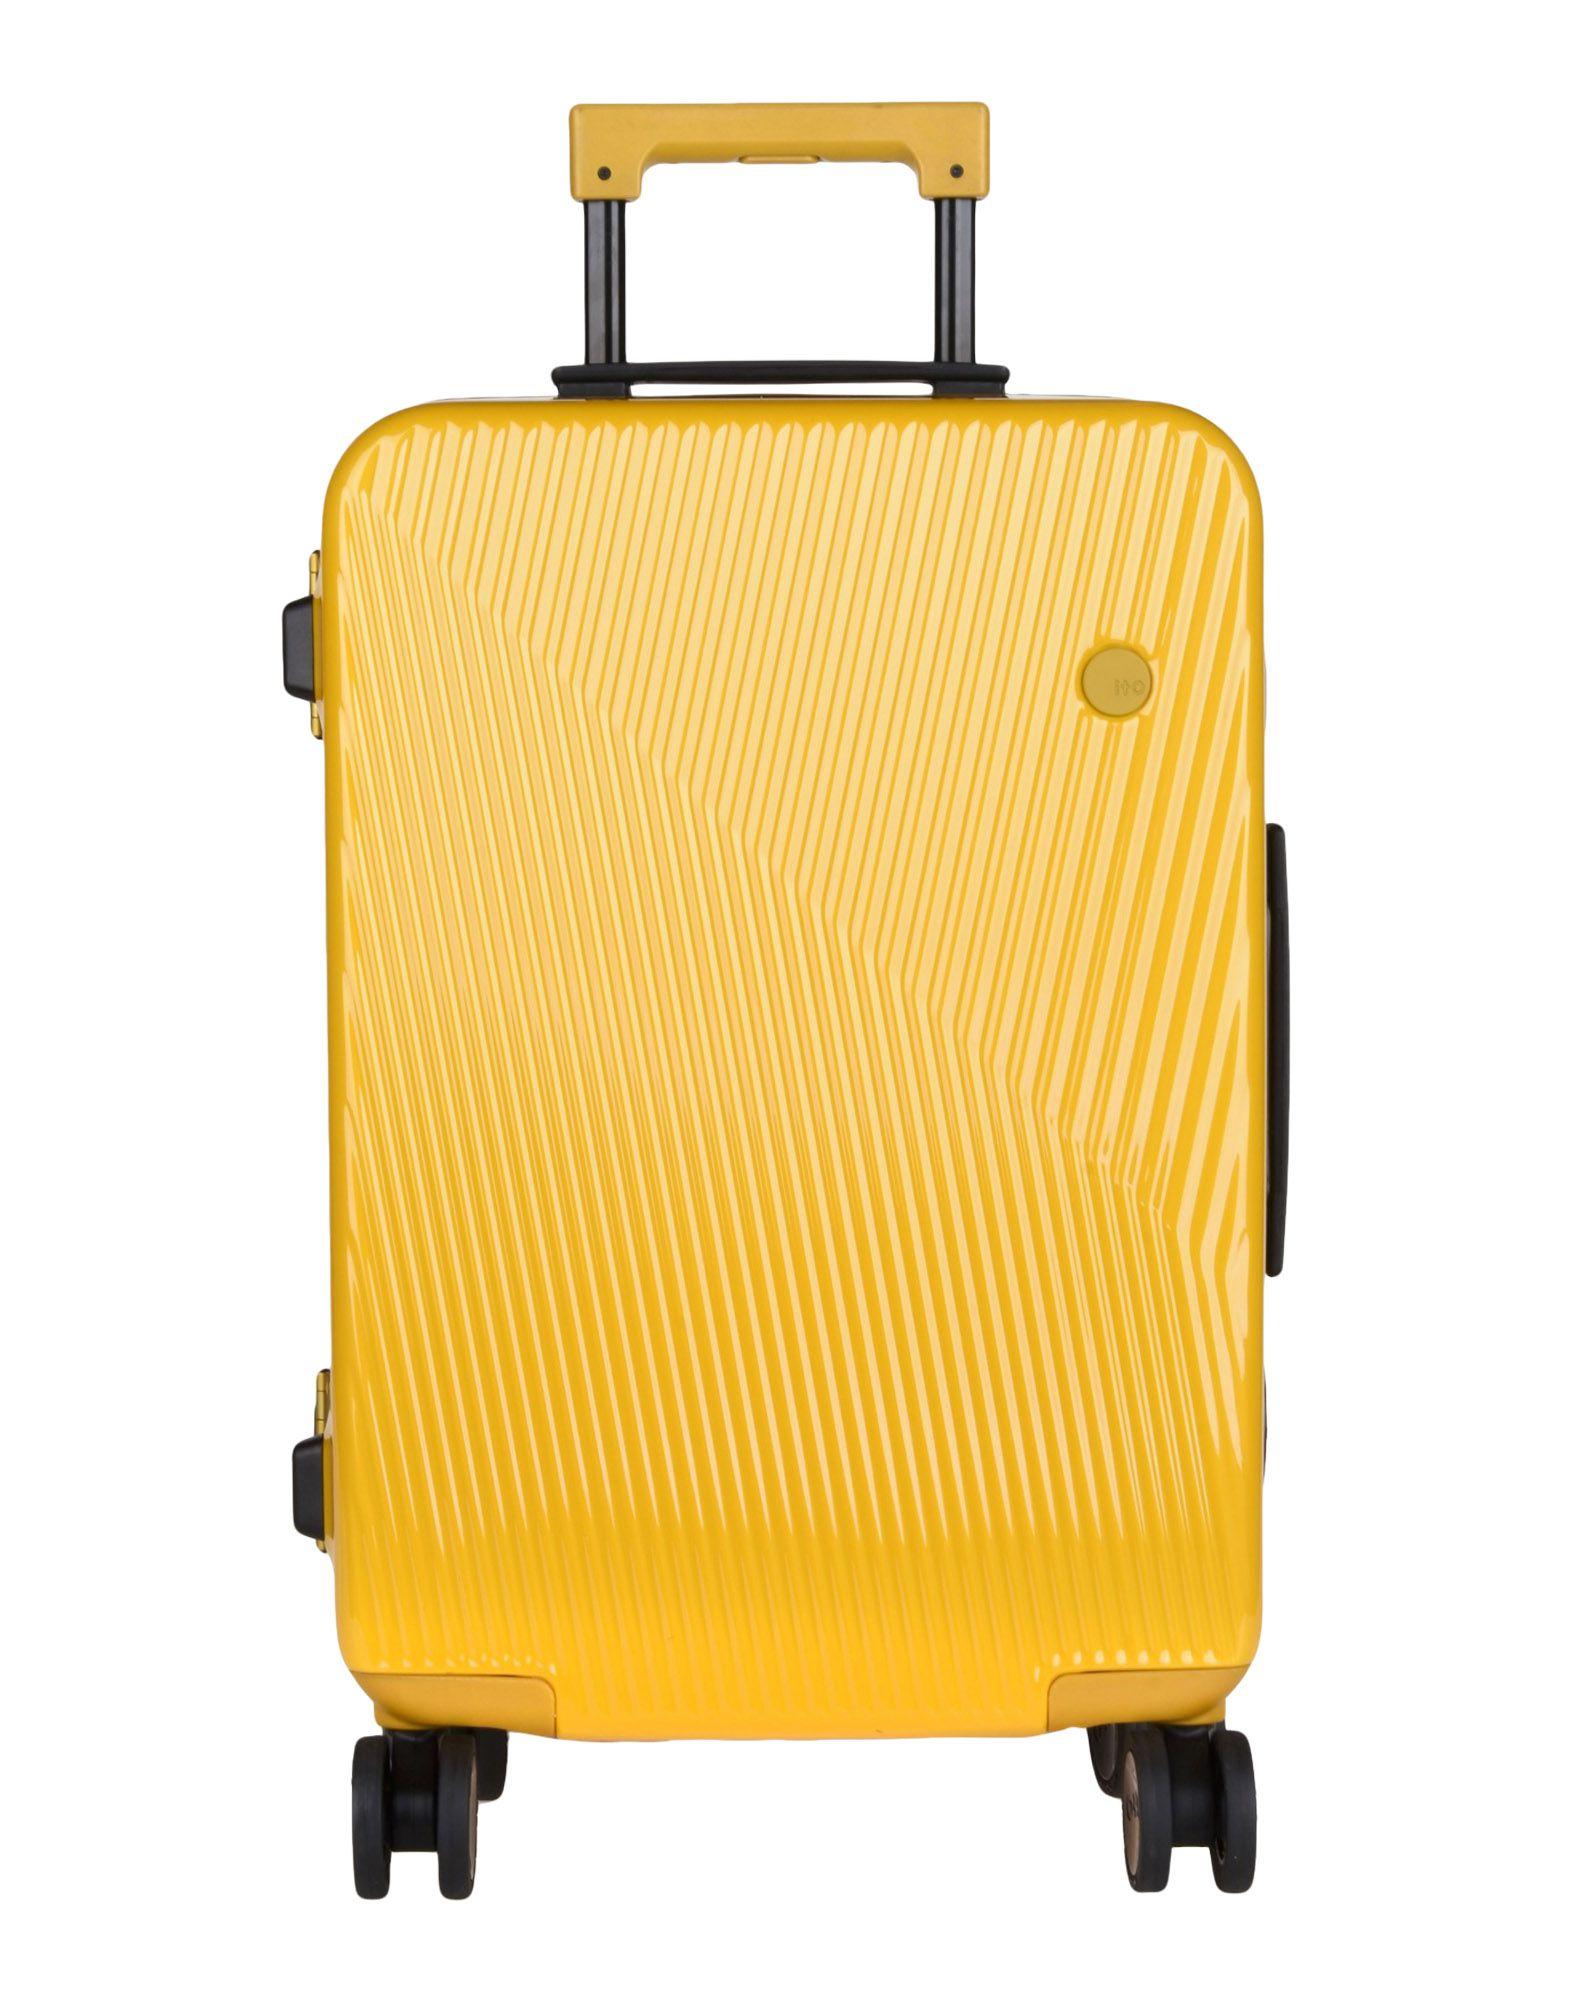 ITO Чемодан/сумка на колесиках аксессуар для дорожной сумки tai lung dl 13 ito